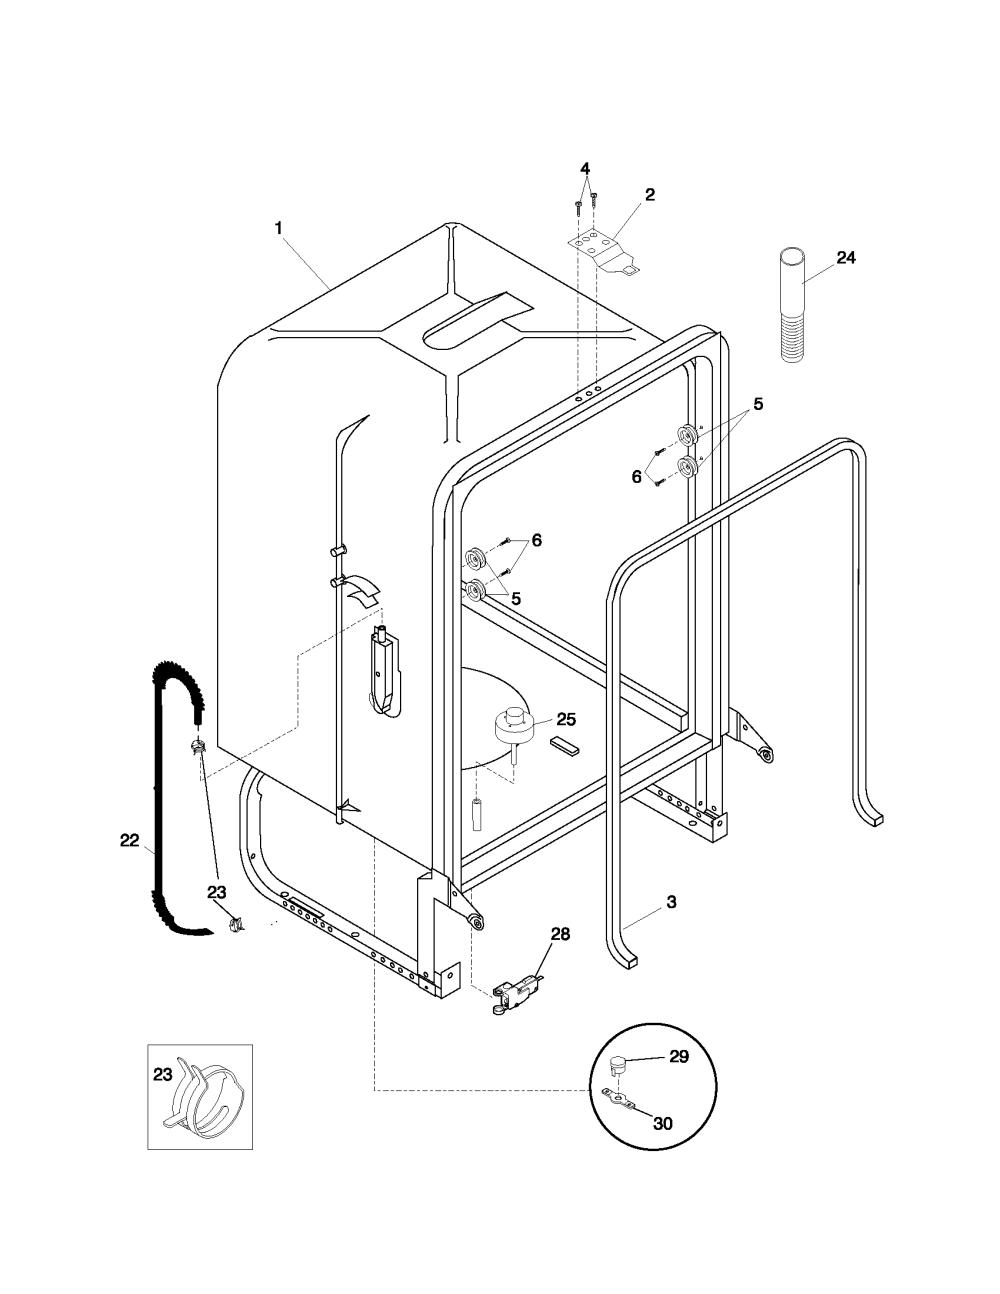 medium resolution of frigidaire dishwasher hose diagram wiring diagrams dishwasher drain hose loop dishwasher hose and wire diagram